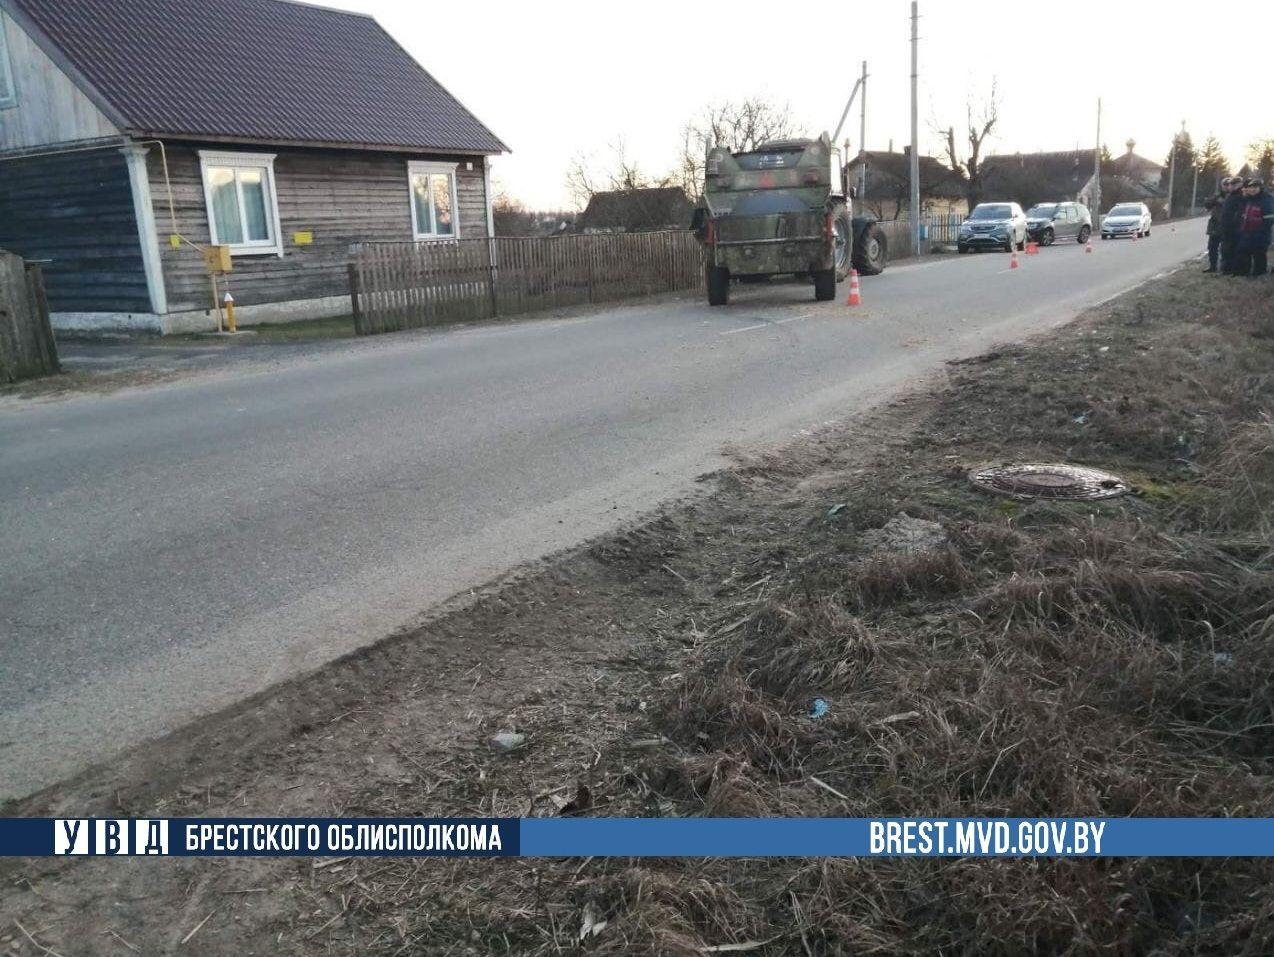 В Дрогичинском районе девушка попала под колеса трактора